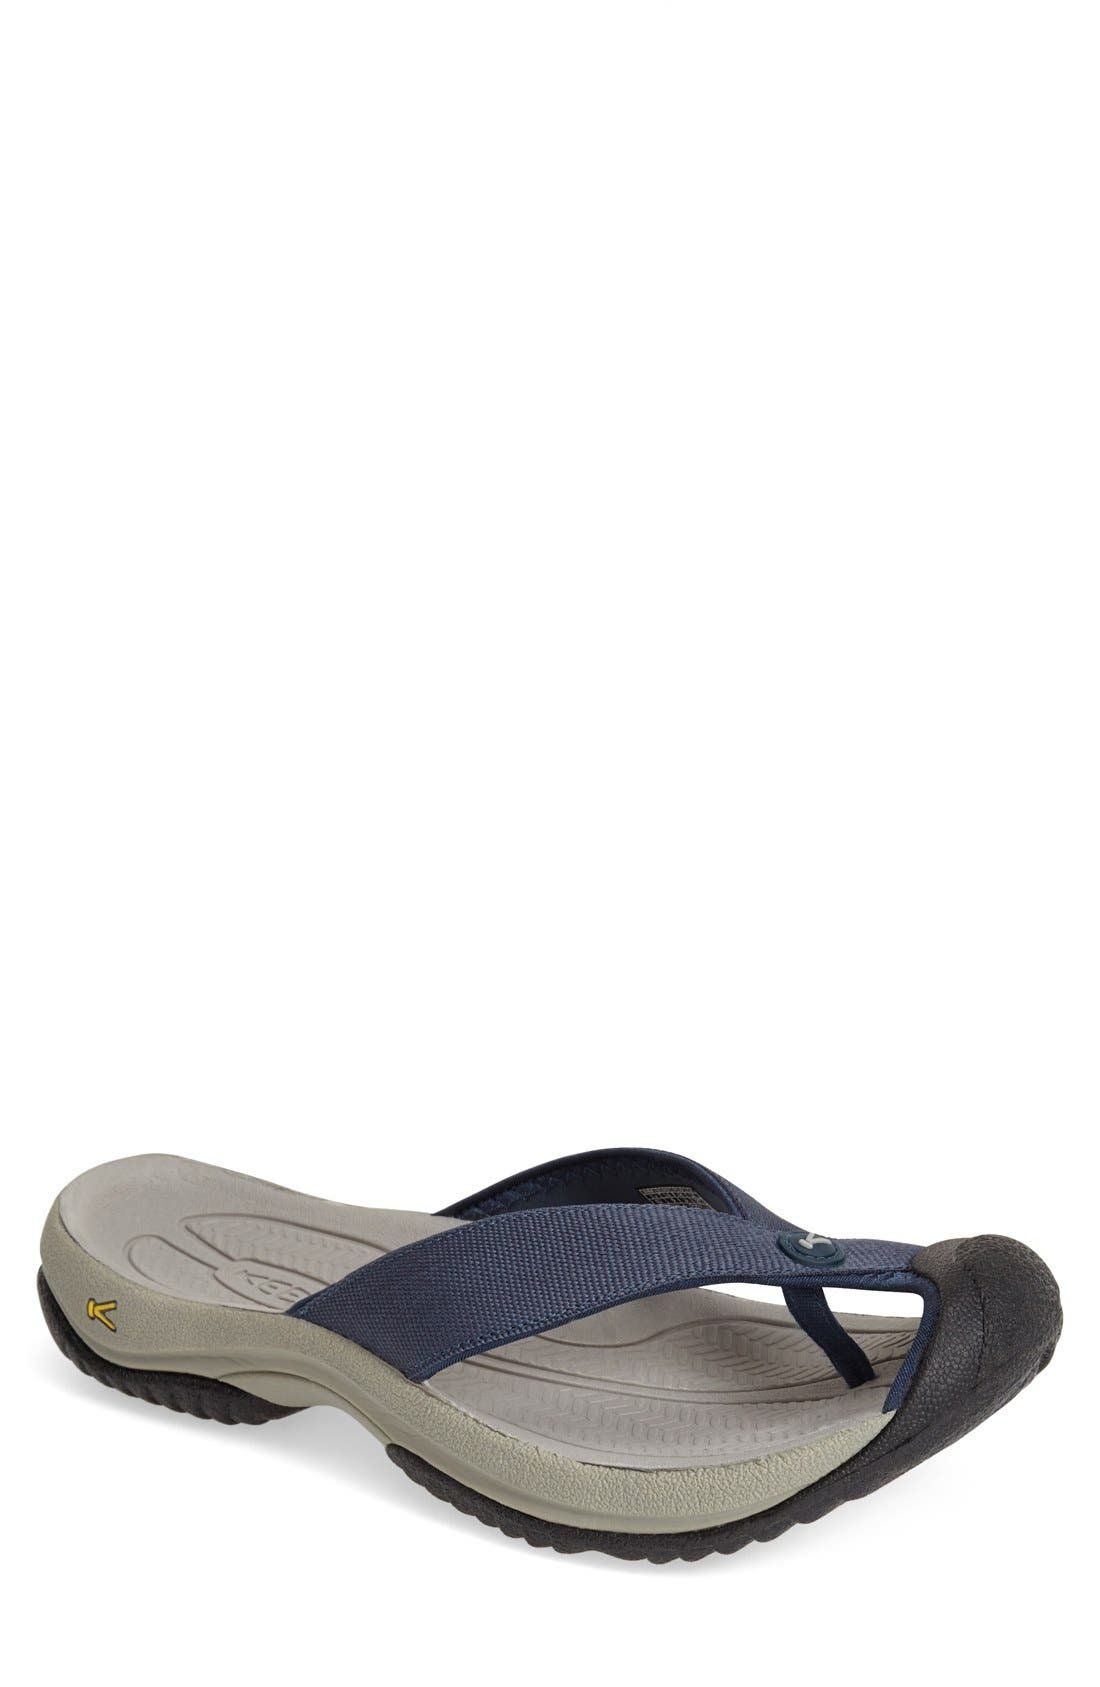 'Waimea H2' Water Thong Sandal,                             Main thumbnail 1, color,                             MIDNIGHT NAVY/ NEUTRAL